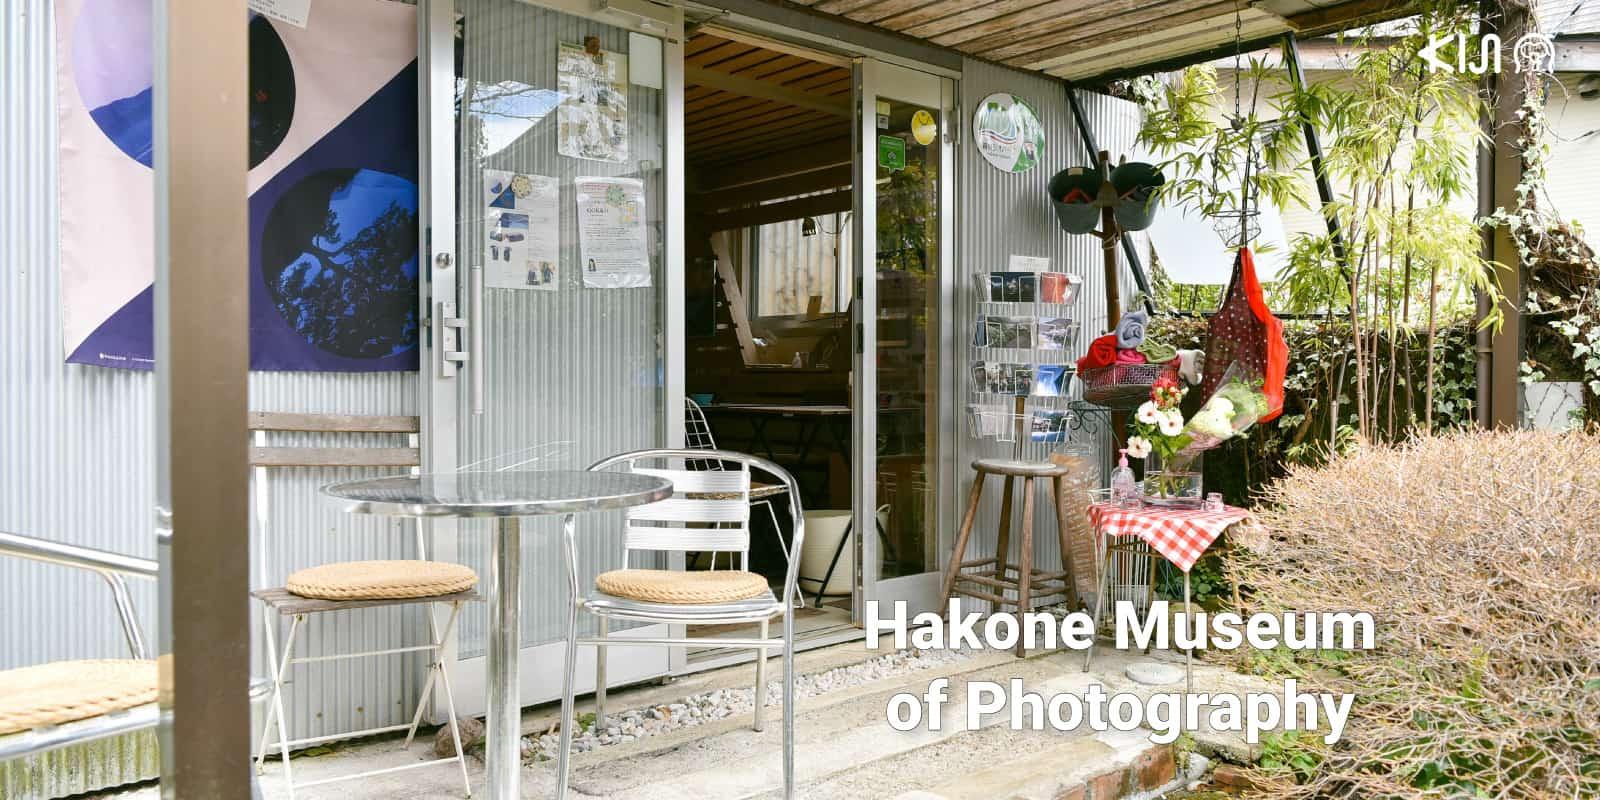 Hakone Museum of Photography ที่เที่ยวฮาโกเน่